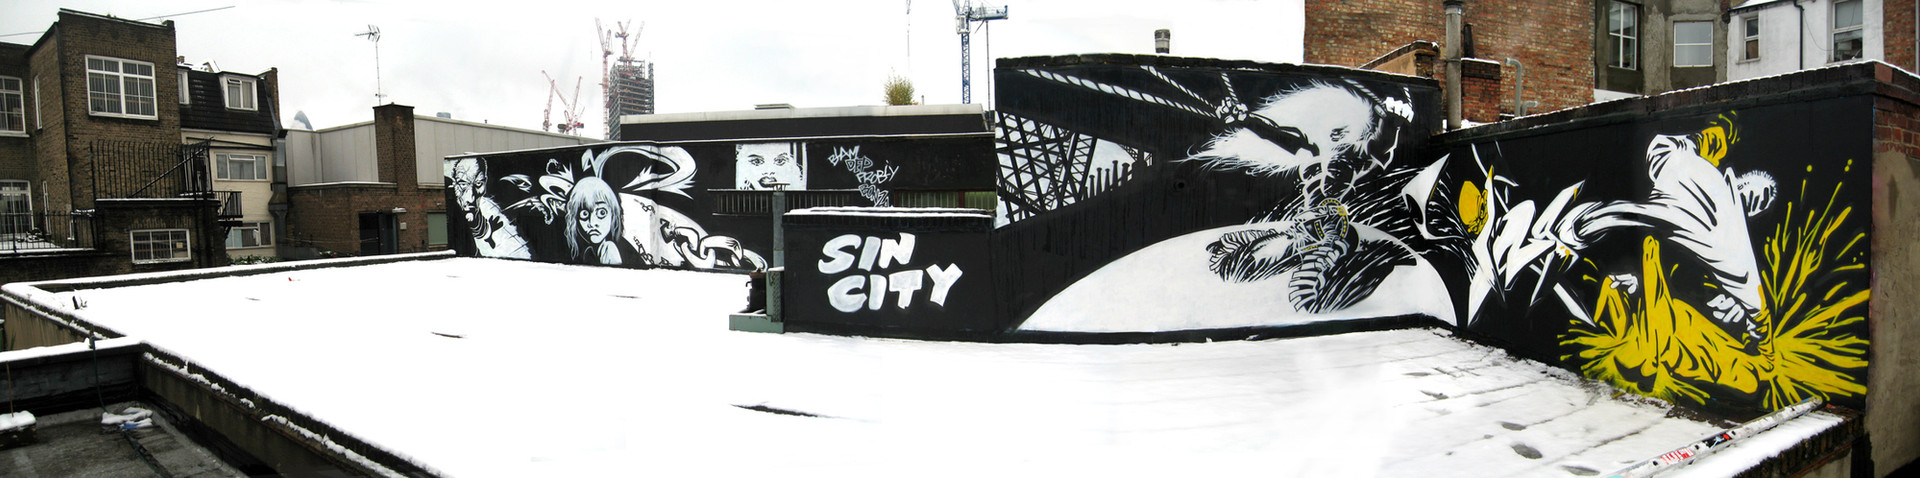 sin city winterweb.jpg